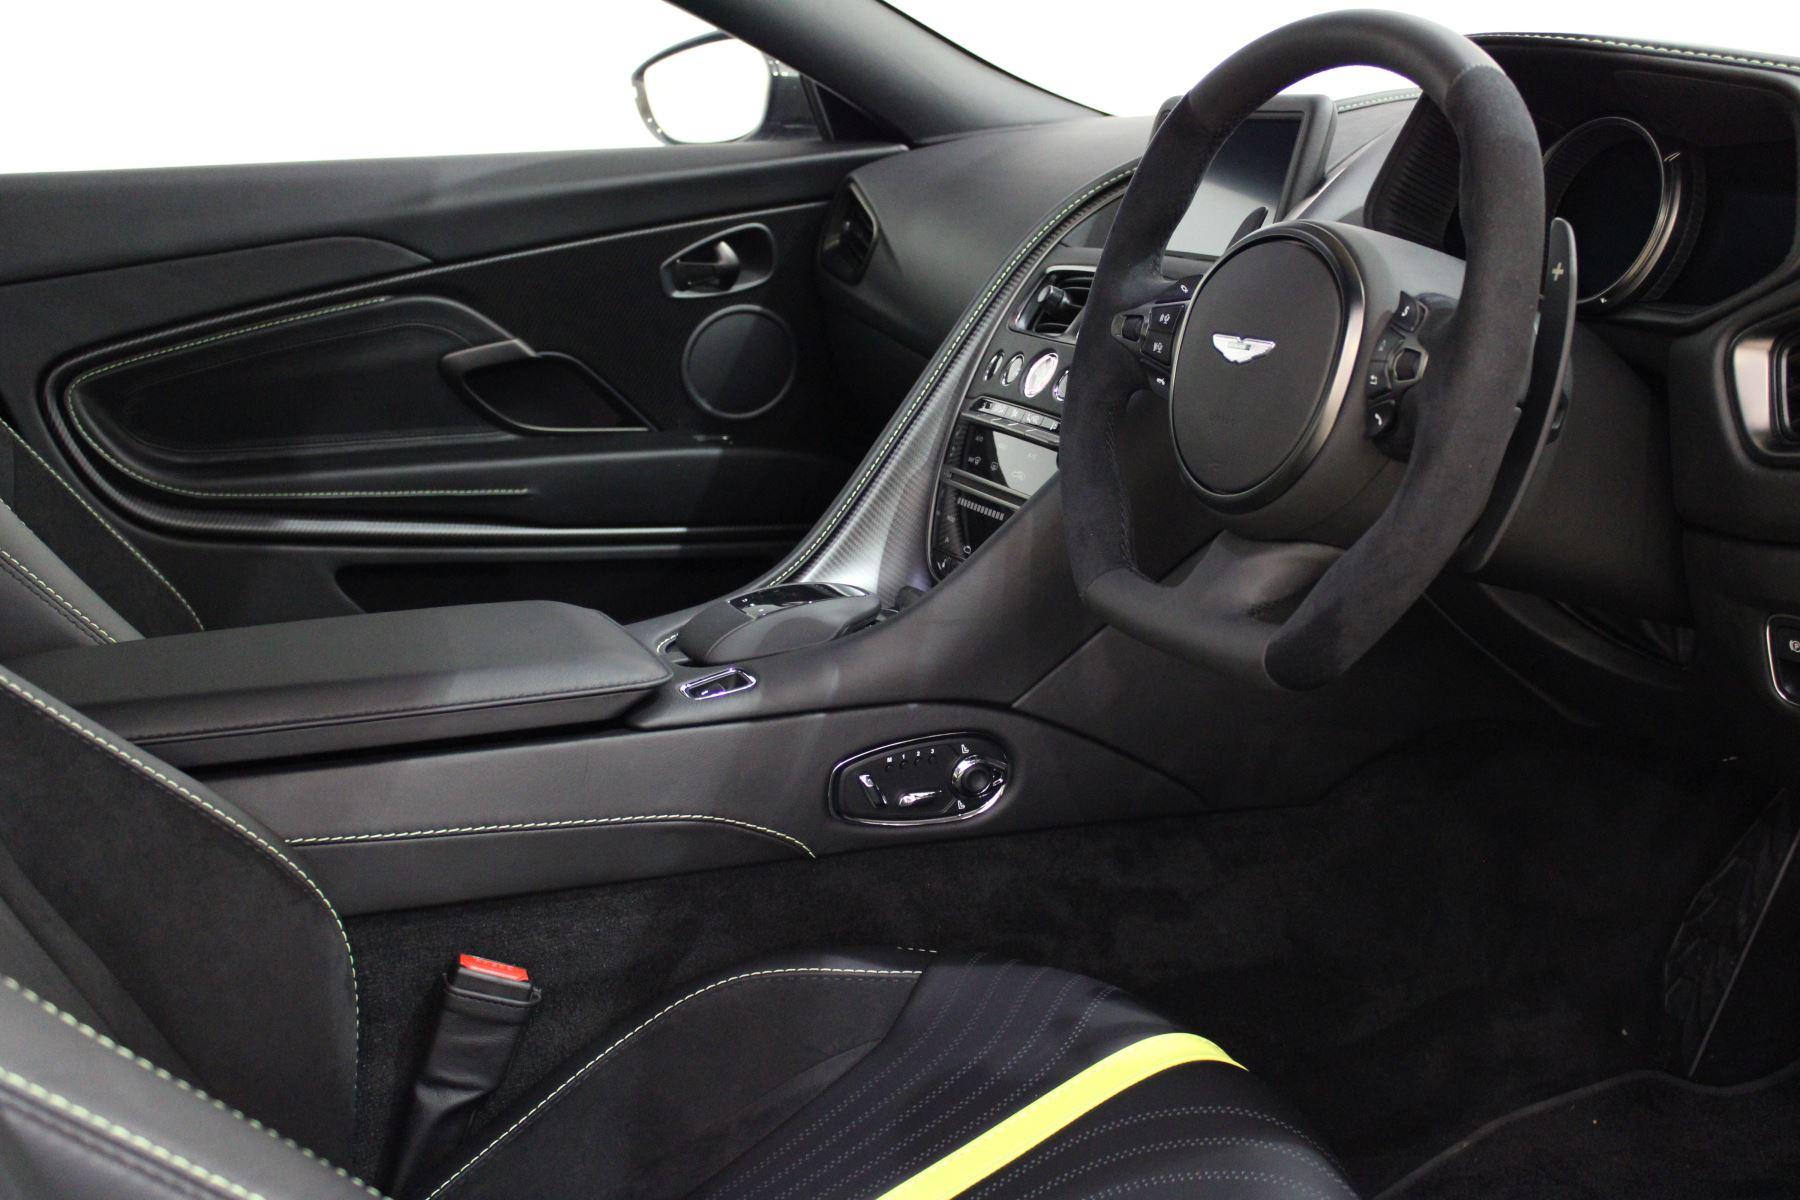 Aston Martin DB11 V12 AMR Touchtronic image 3